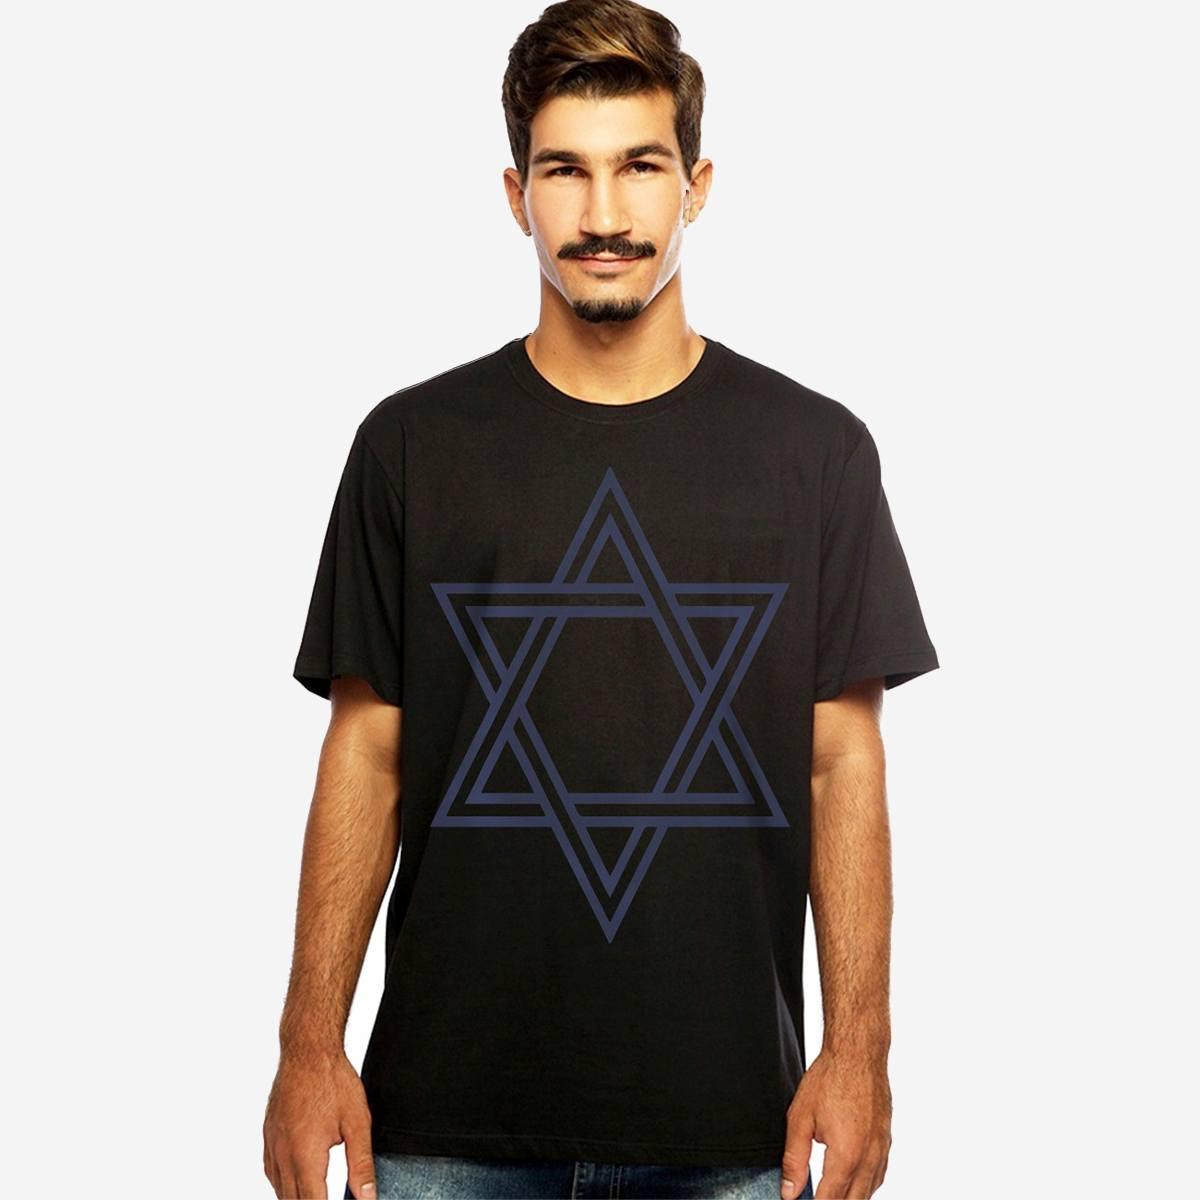 Camiseta Masculina Preta Manga Curta Estrela de Davi Hardivision